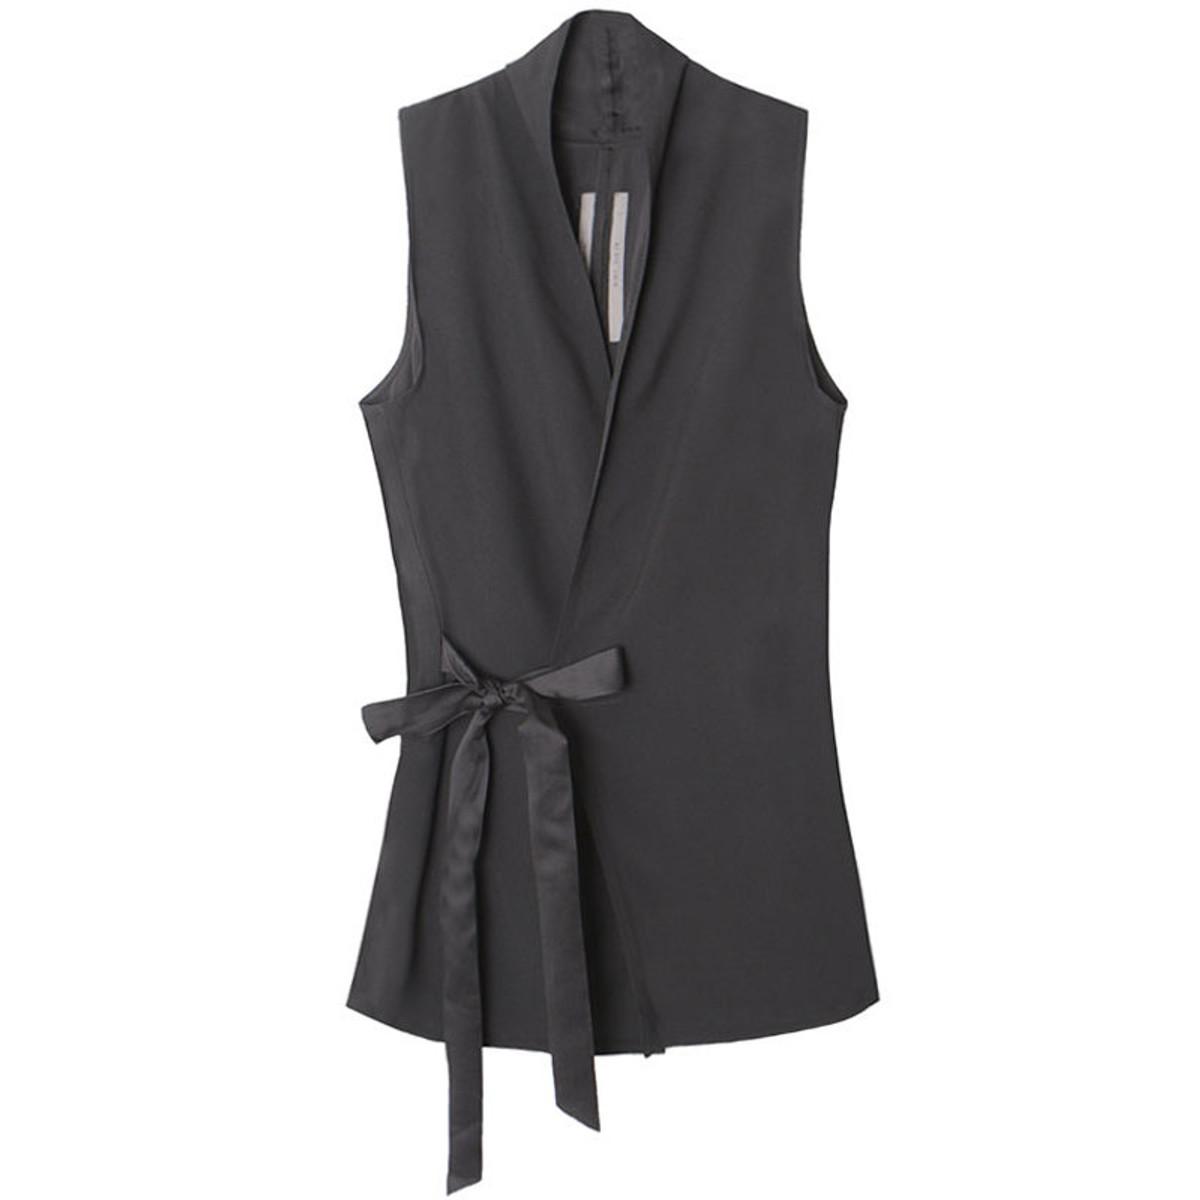 6e8cf893eecb Rick Owens Black Wrap Vest